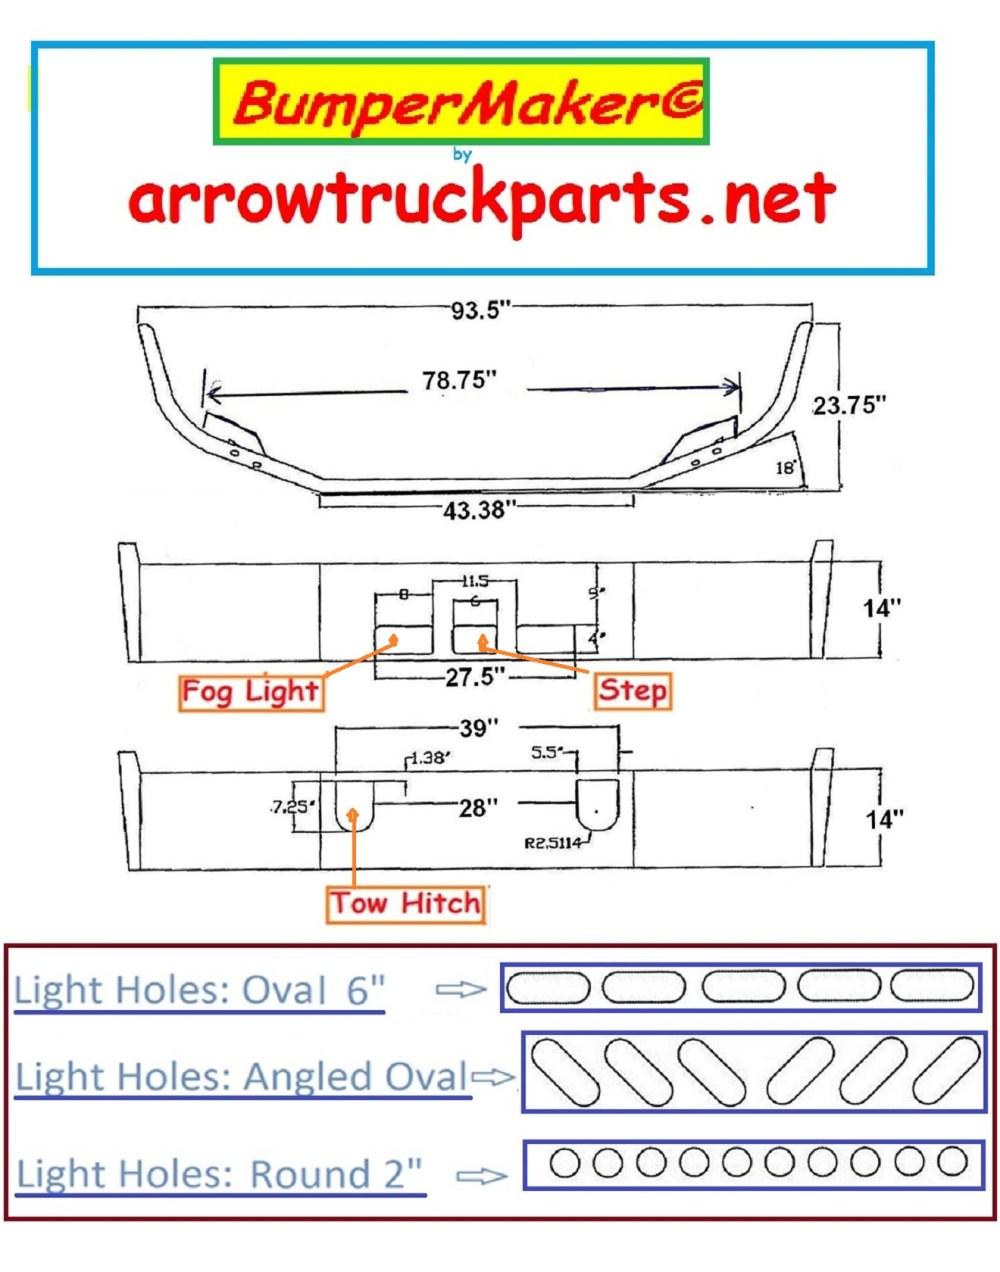 medium resolution of mack wiring schematics mack parts diagram mack special tools mack truck wiring